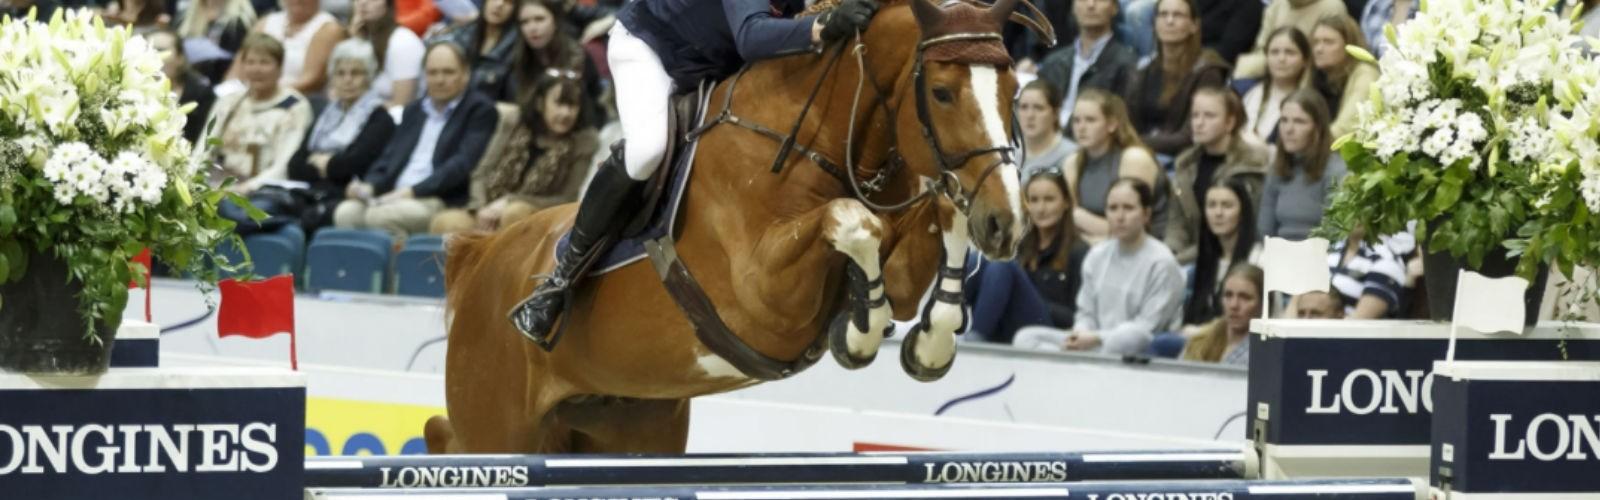 LONGINES_Equestrian